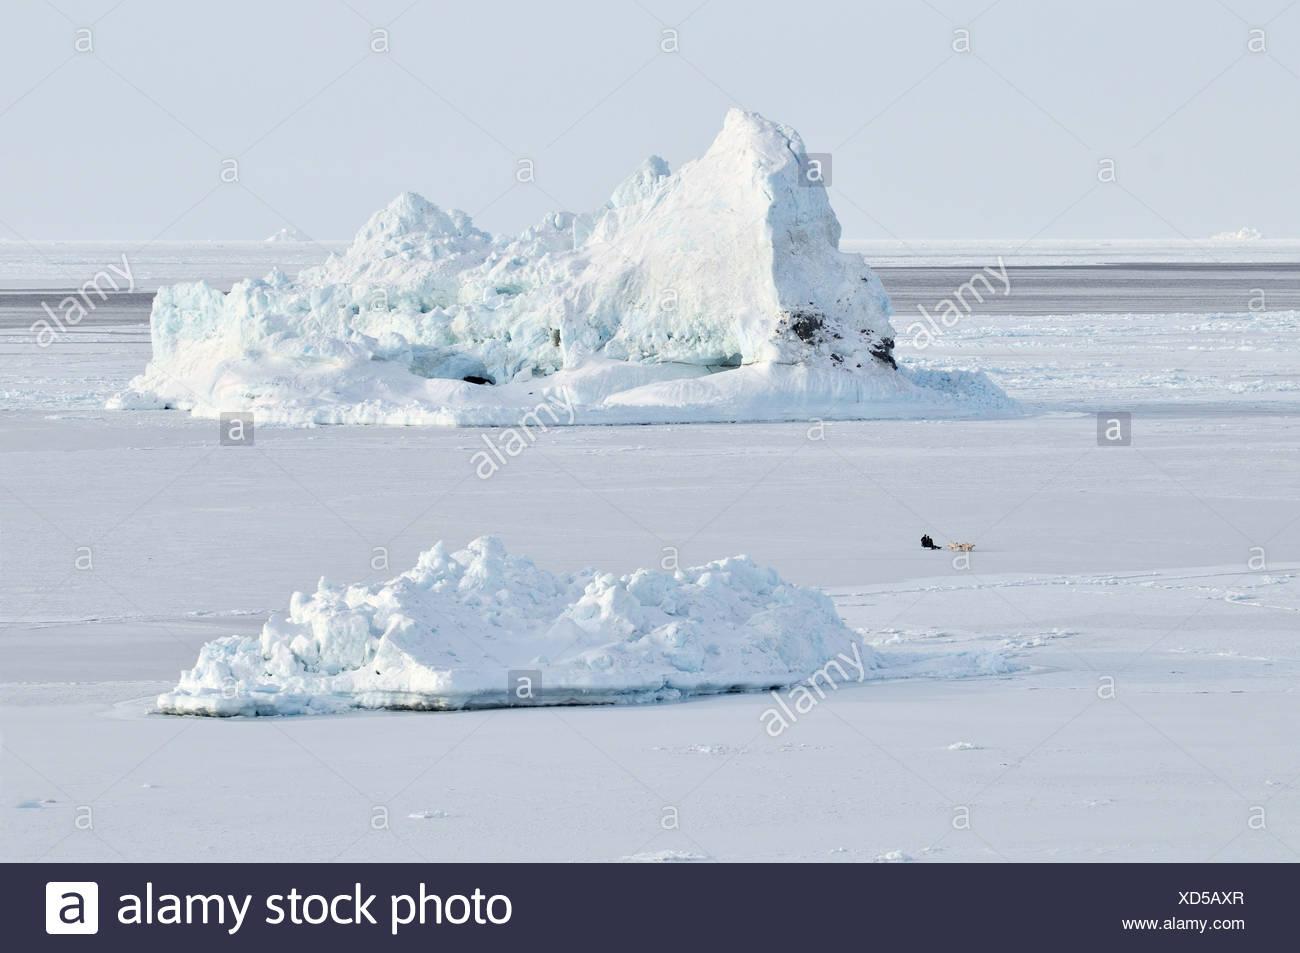 Frozen fjord, dog sled, Qeqertarsuaq or Disko Island, Greenland, Arctic North America - Stock Image